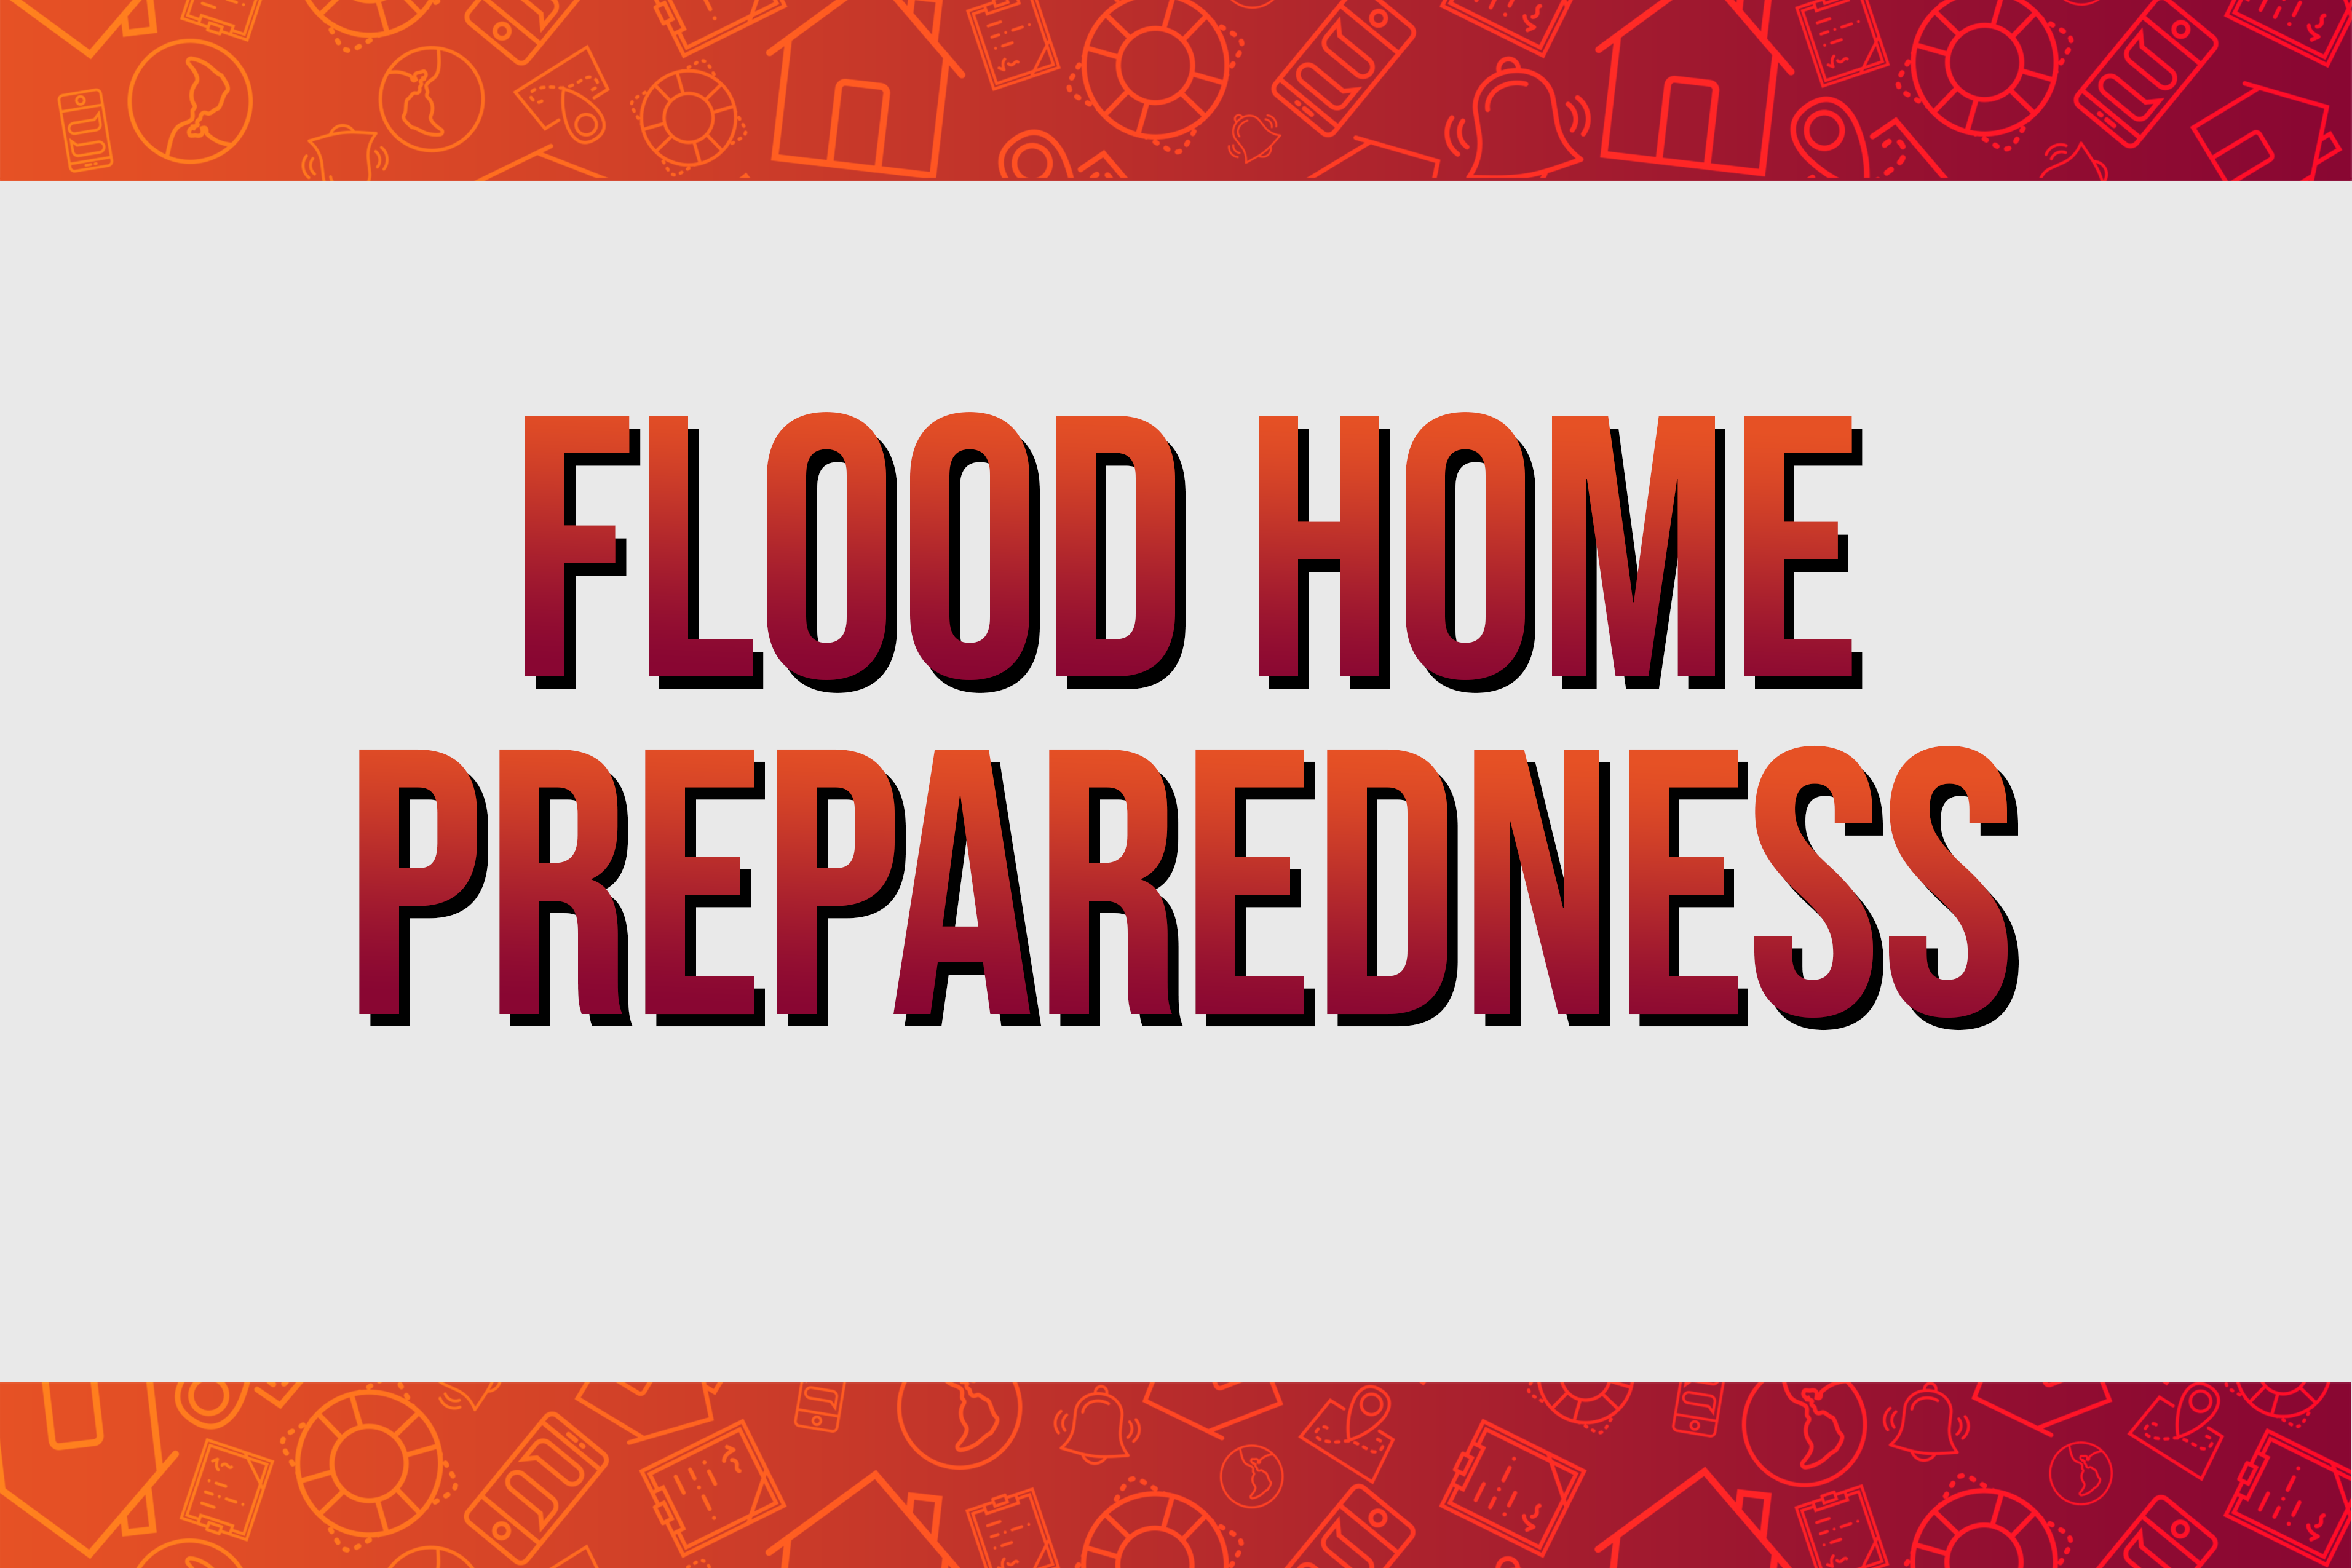 Flood Home Preparedness